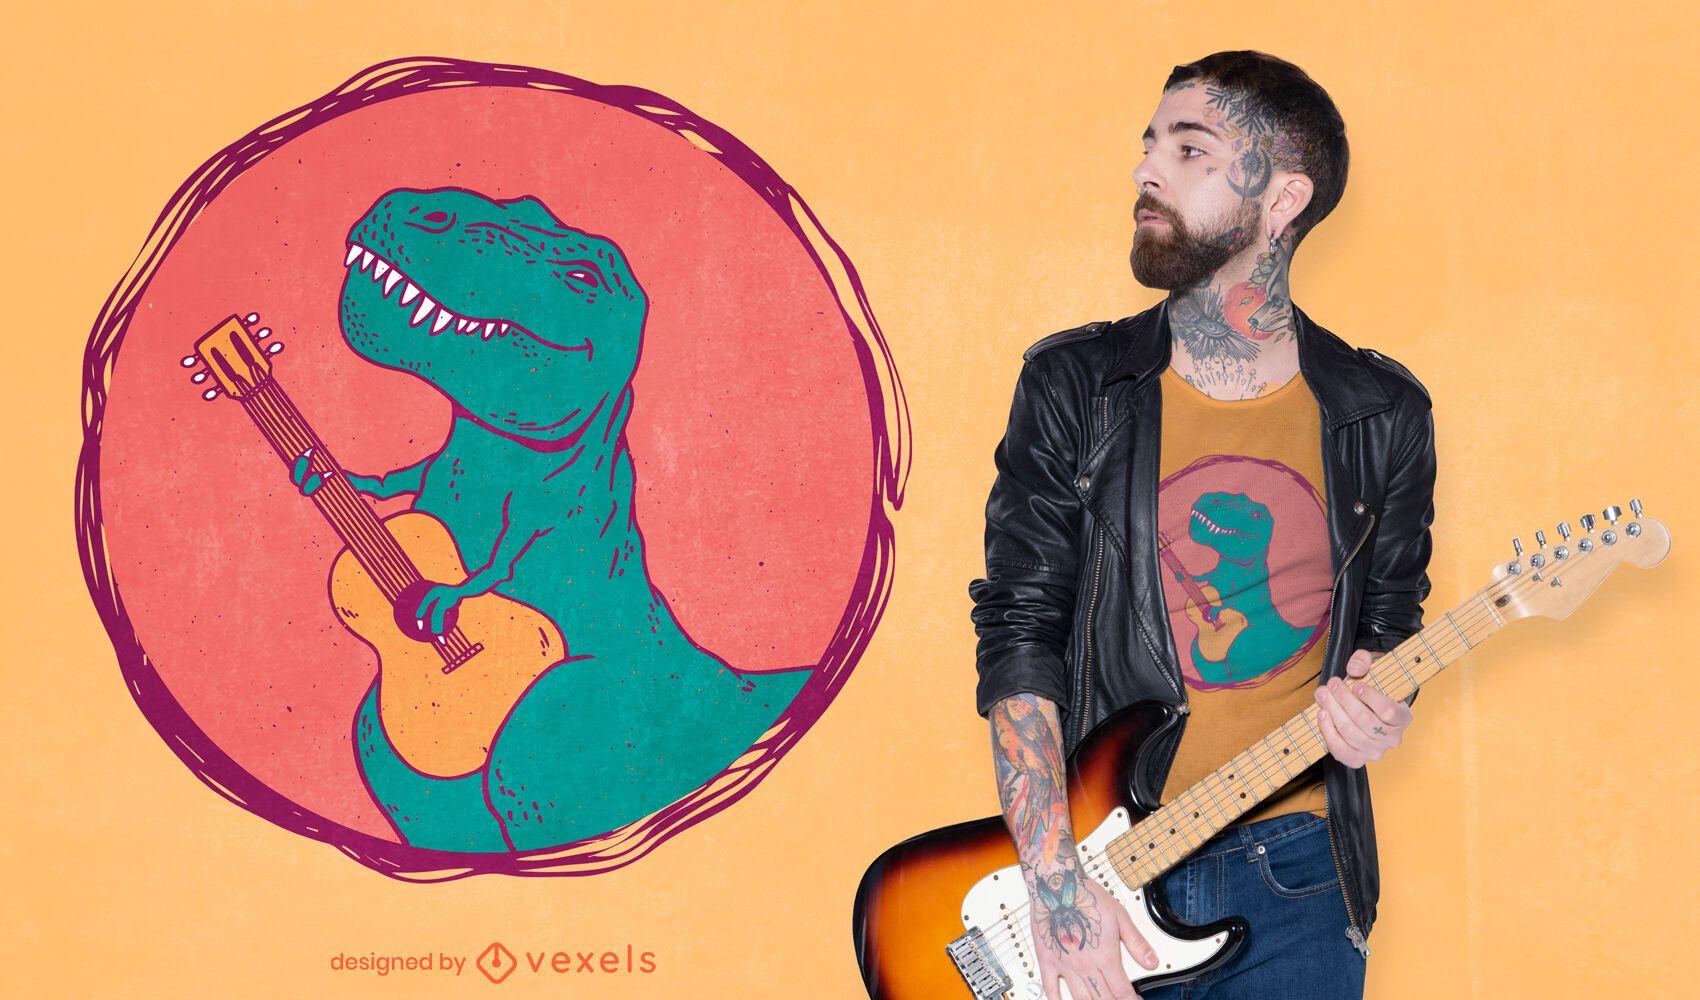 Dise?o de camiseta de guitarrista t-rex.